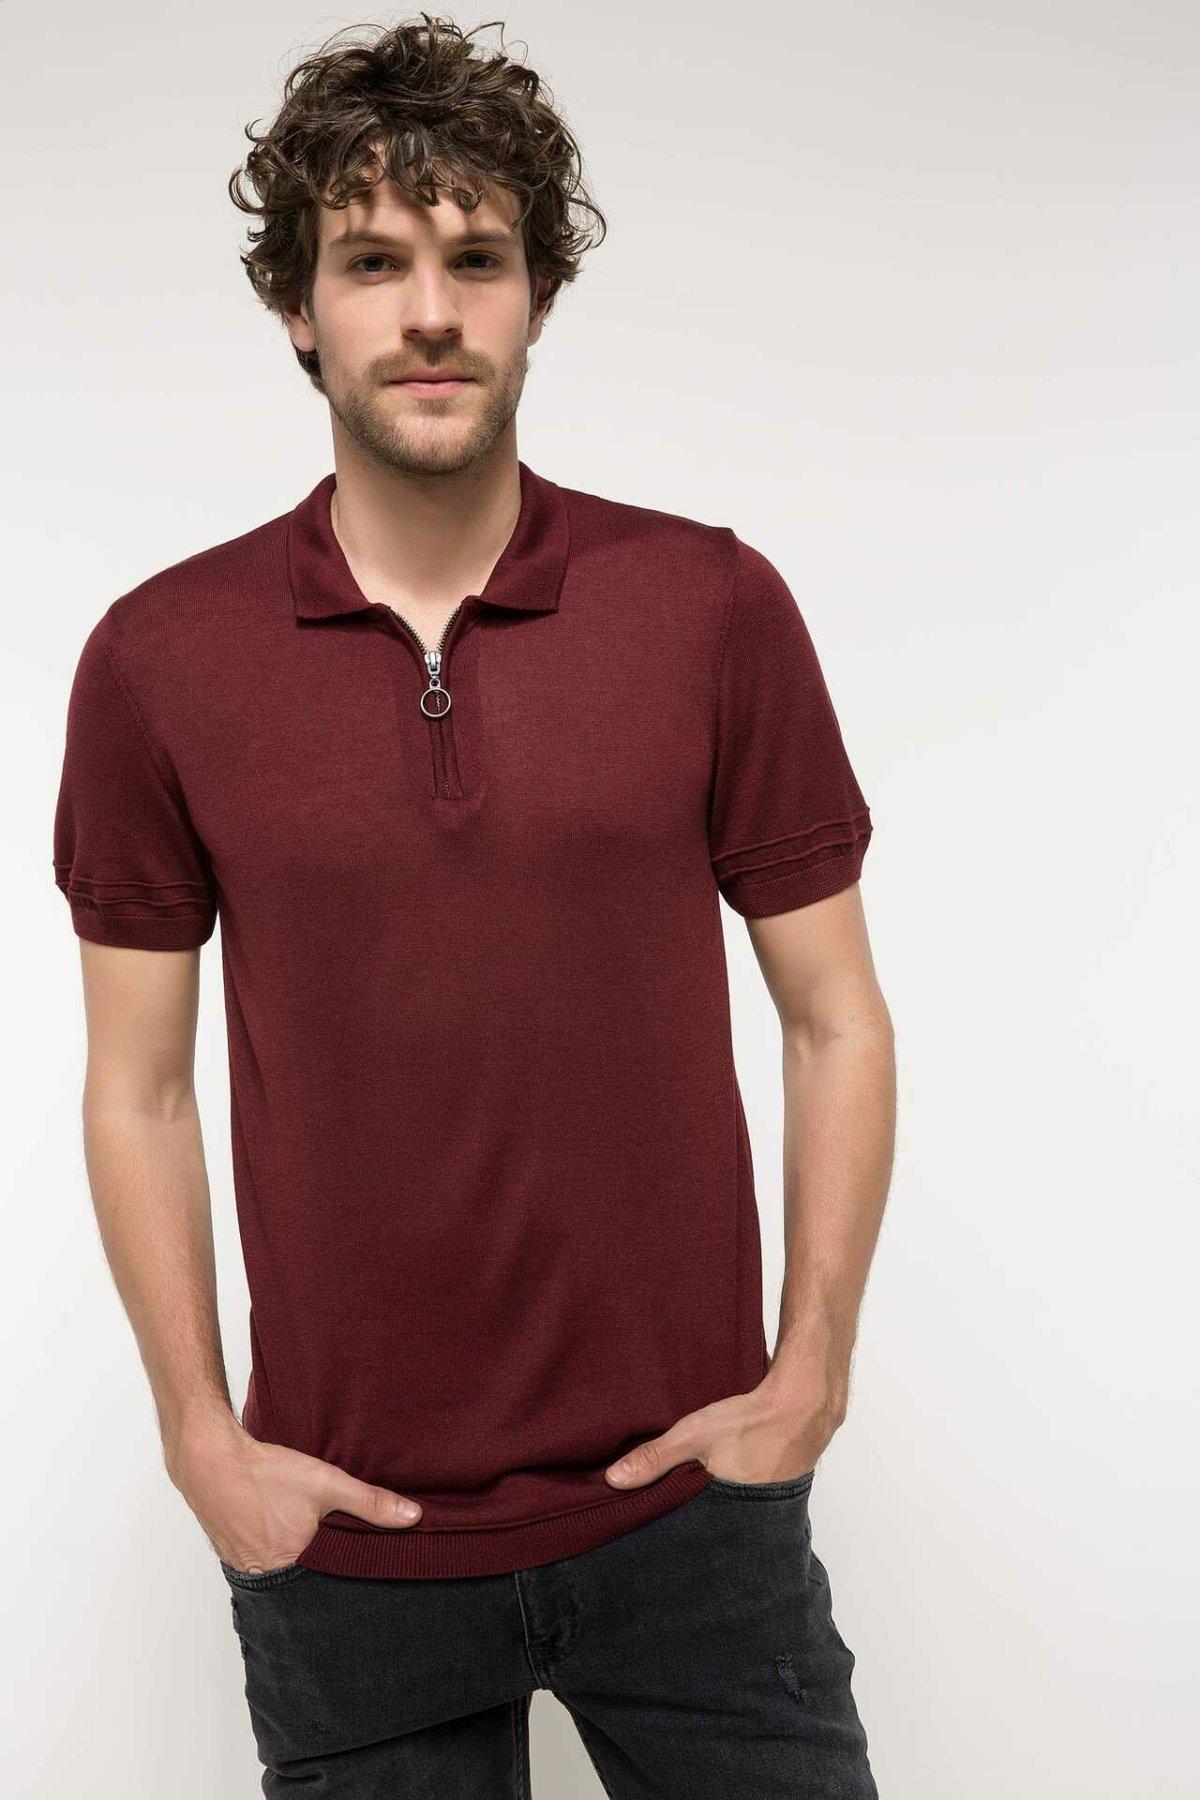 DeFacto Man Fashion Polo Shirt Casual Fashion Male Zipper Polo Shirt Short Sleeve High Quality Cotton Polo Shirt-I5899AZ18SM